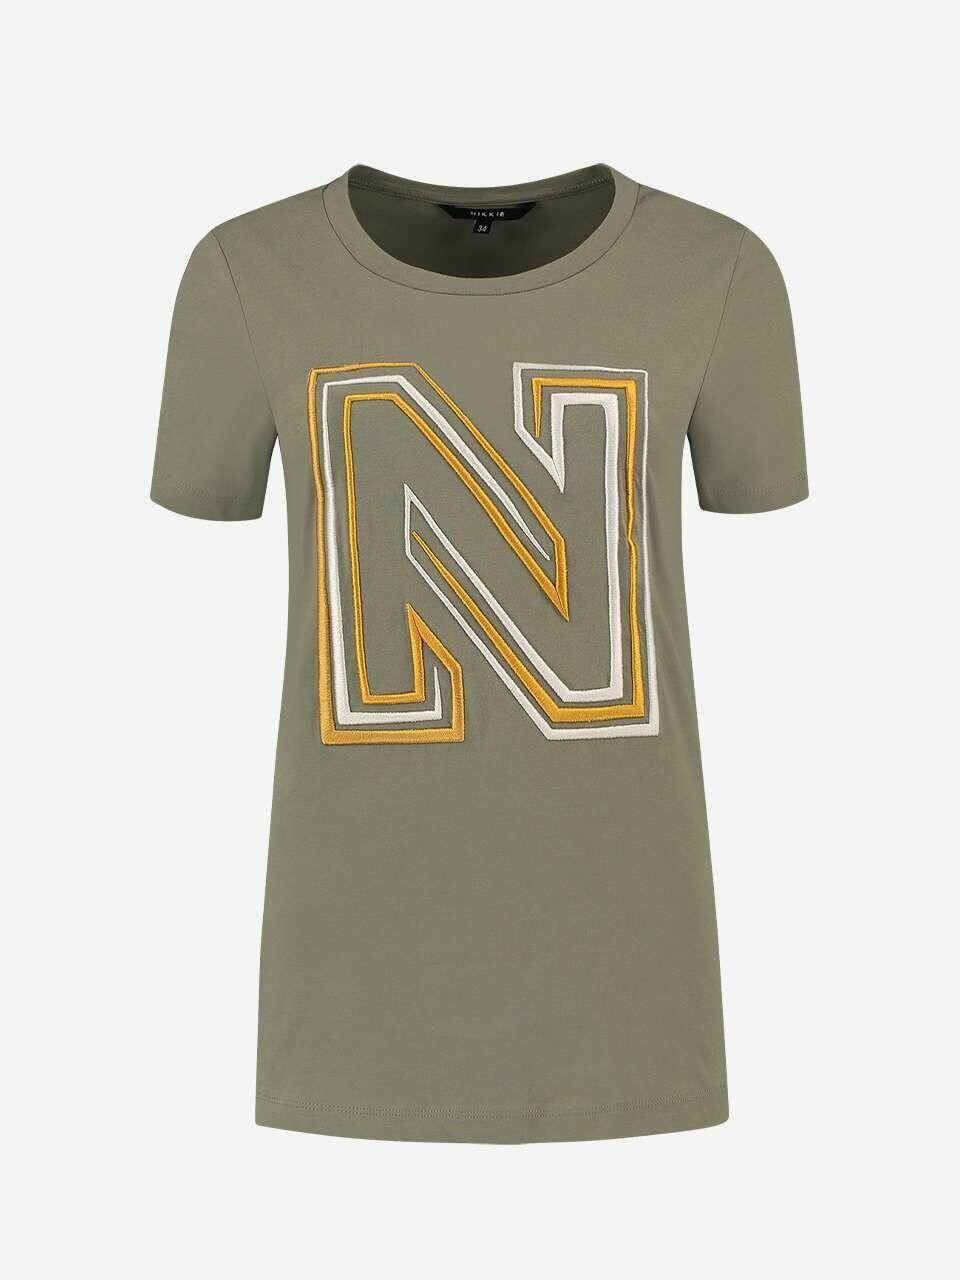 N Logo Embroidery Shirt